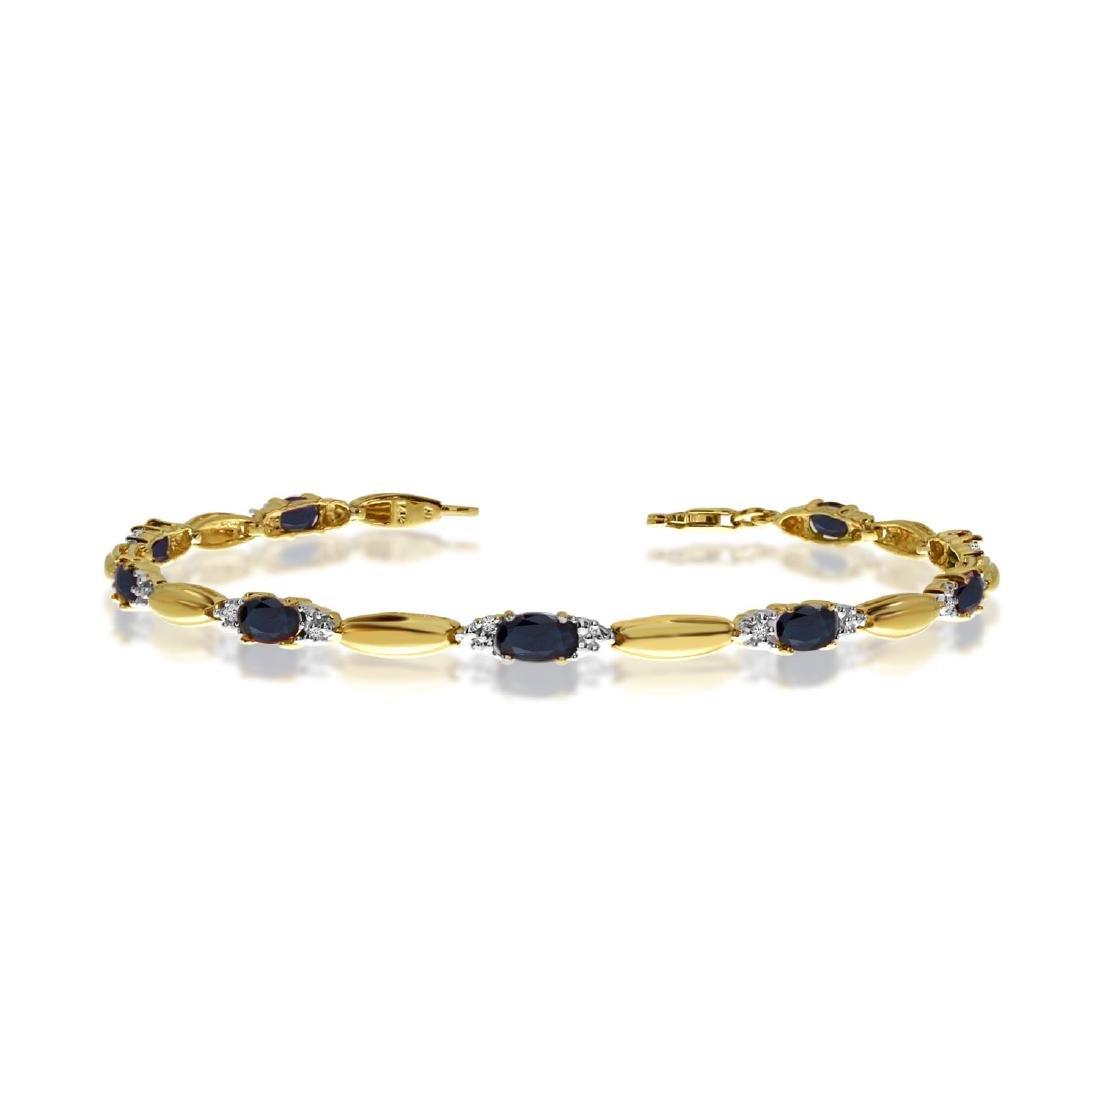 Certified 14K Yellow Gold Oval Sapphire and Diamond Bra